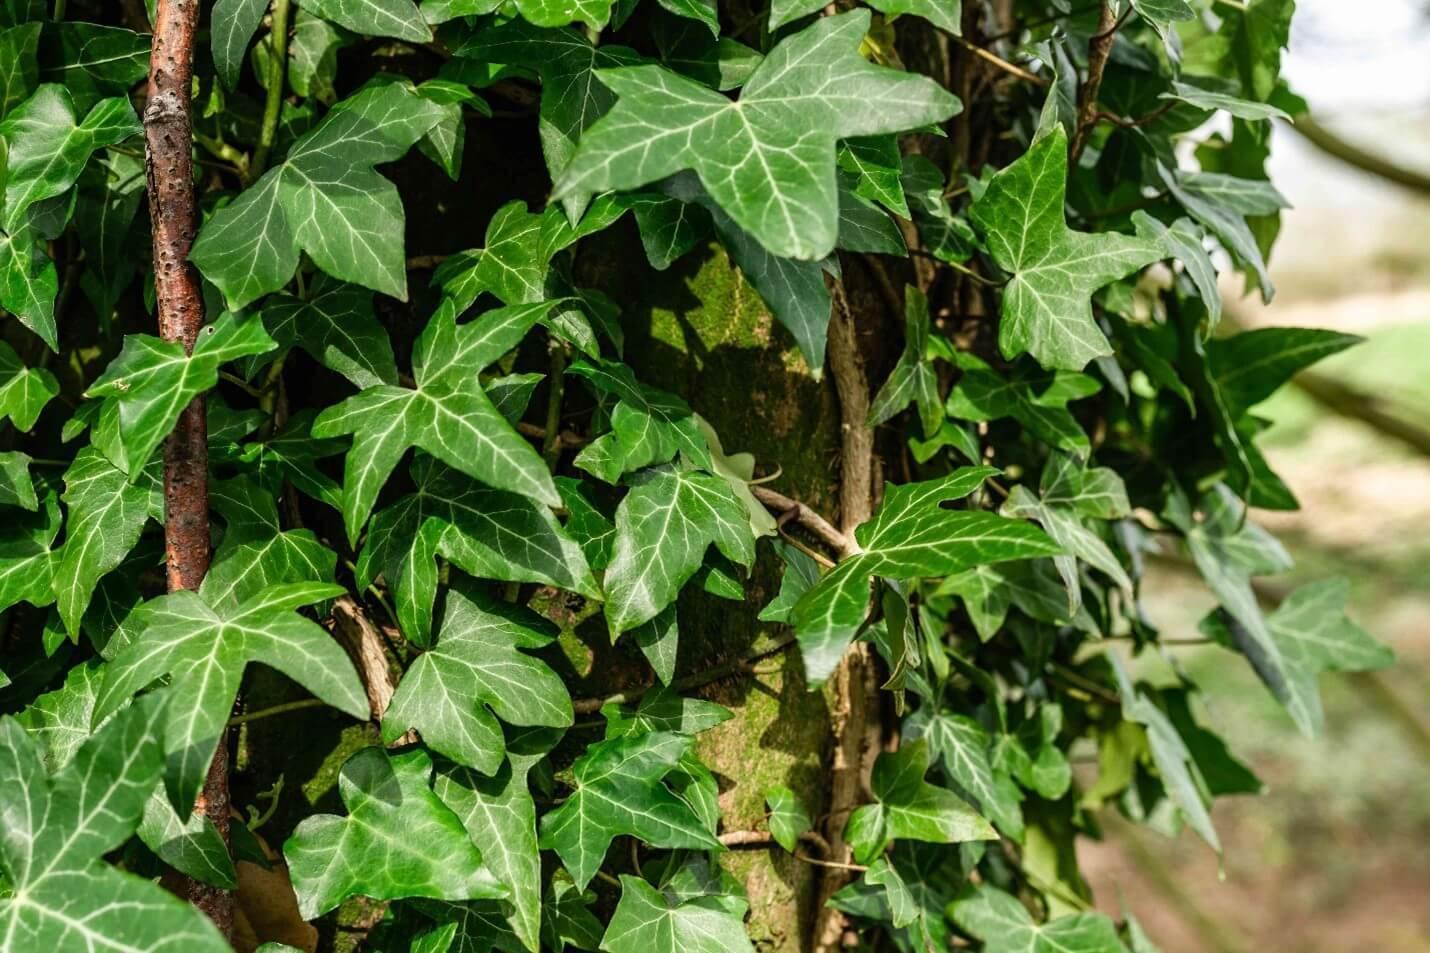 Russian ivy